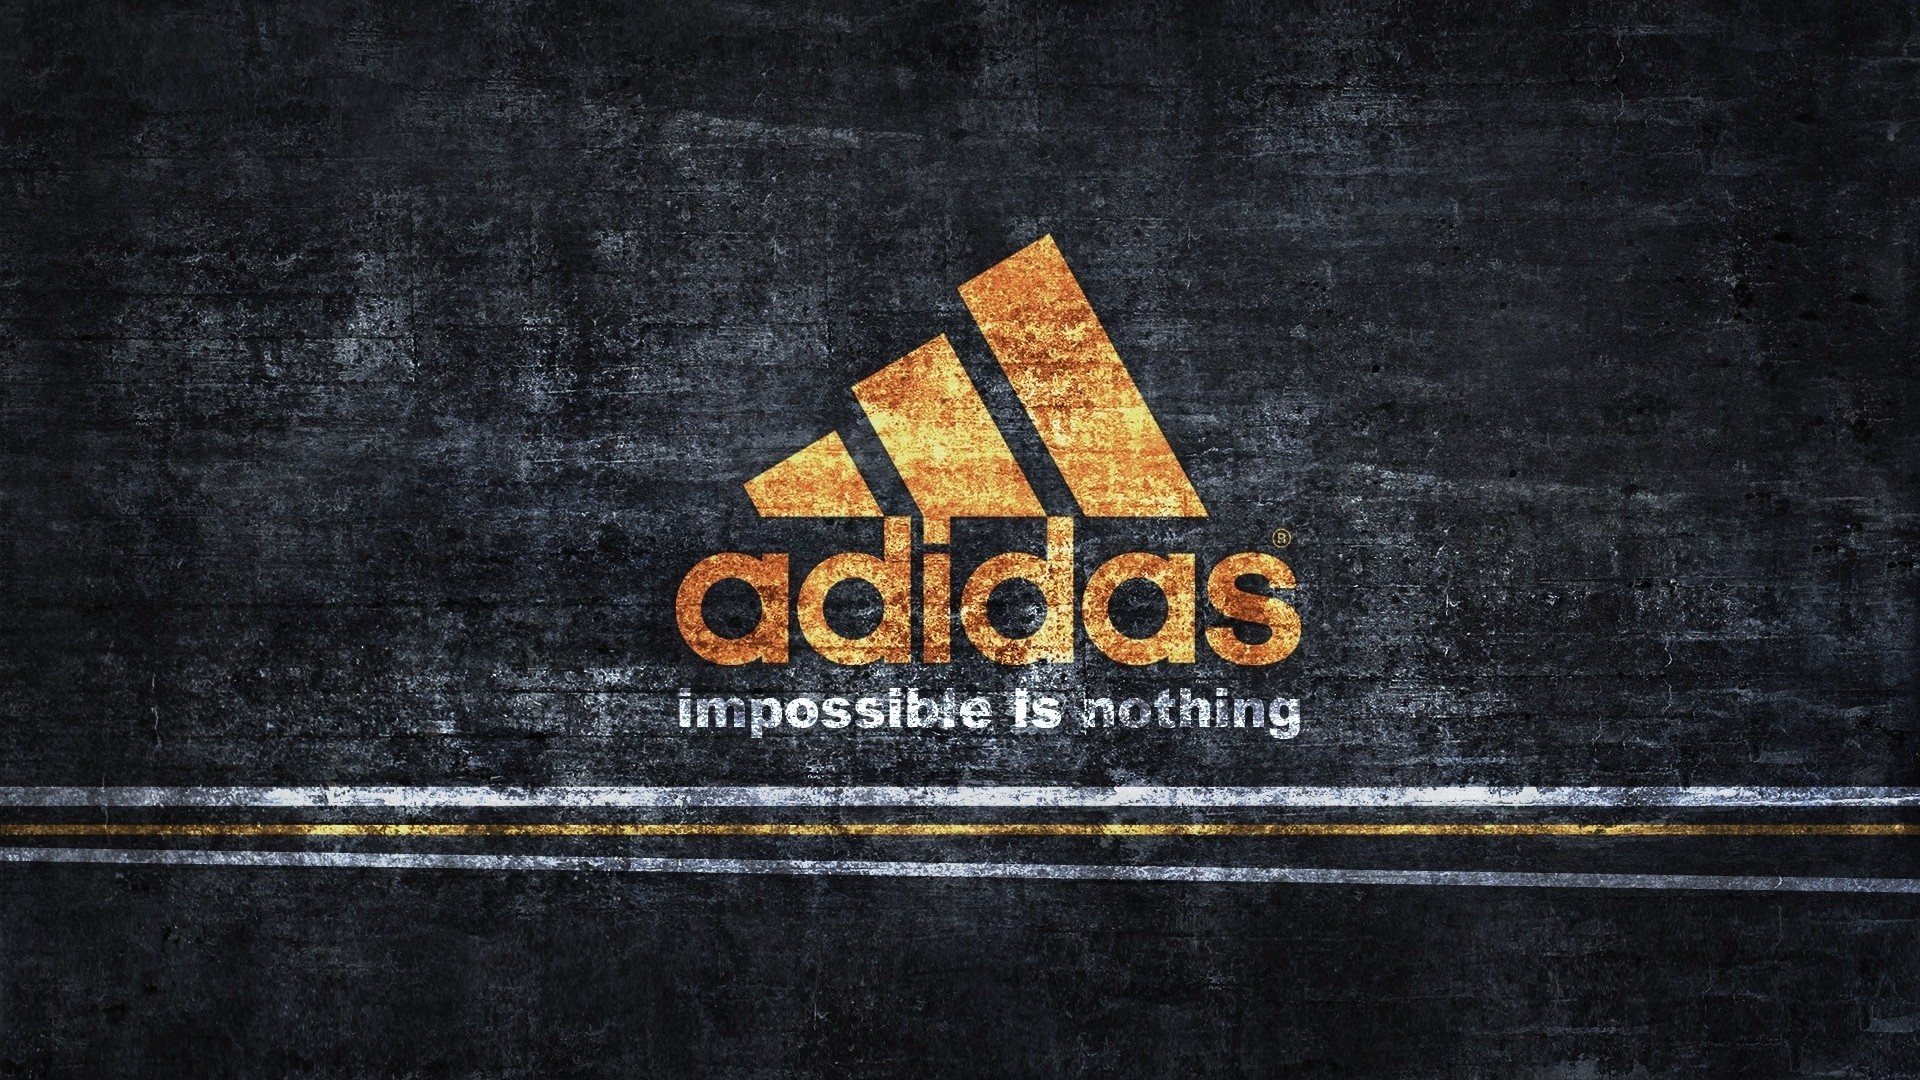 awesome adidas wallpapers, adidas logo hd